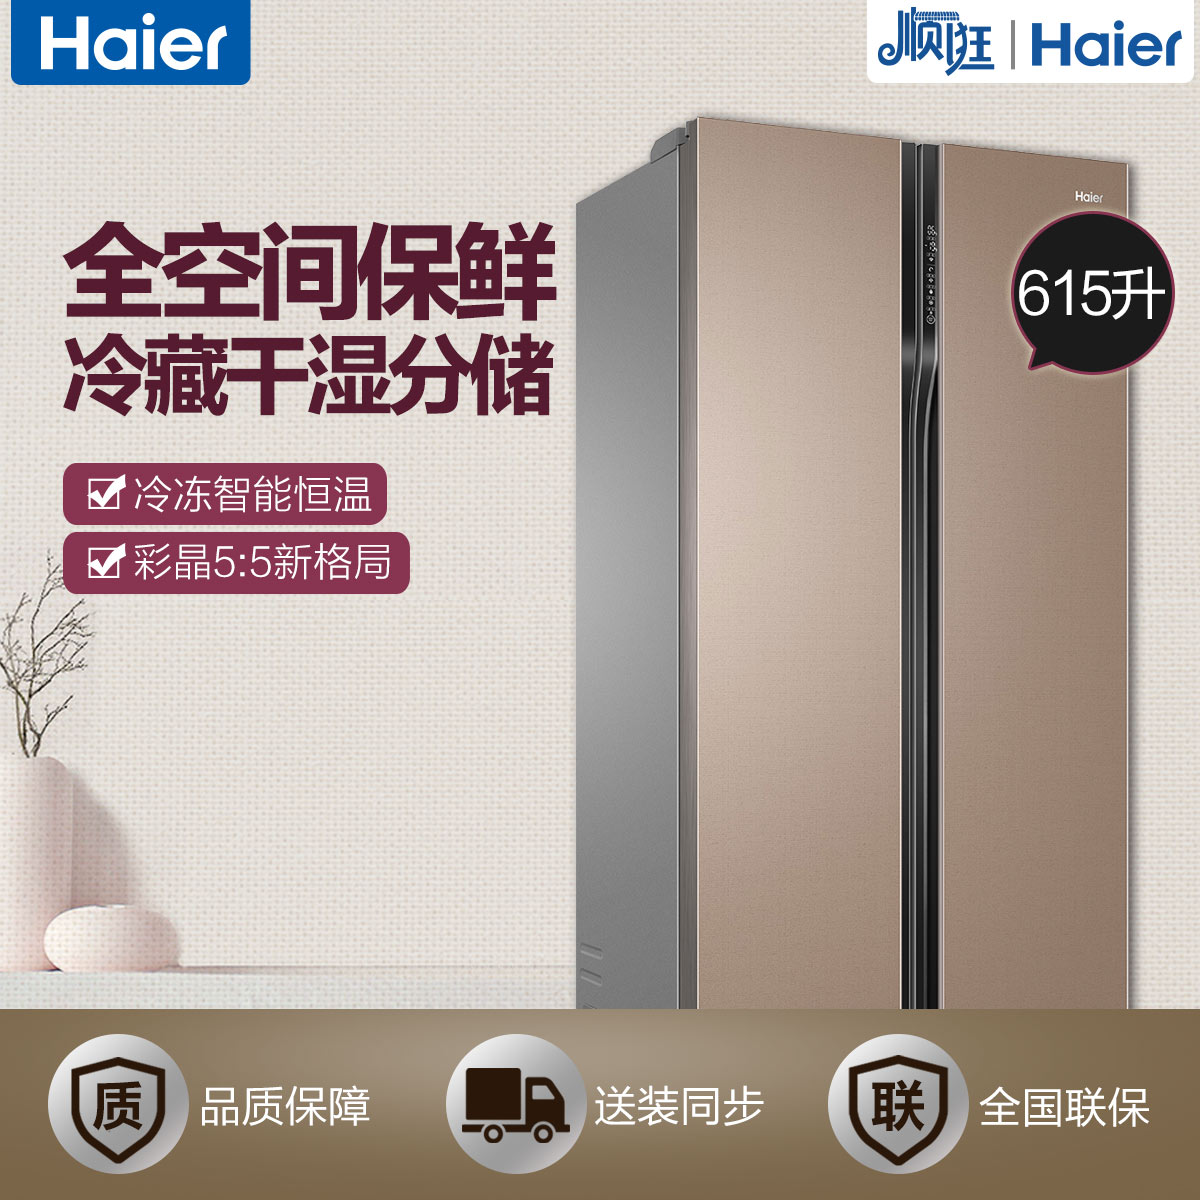 Haier/海尔冰箱BCD-615WDCZ